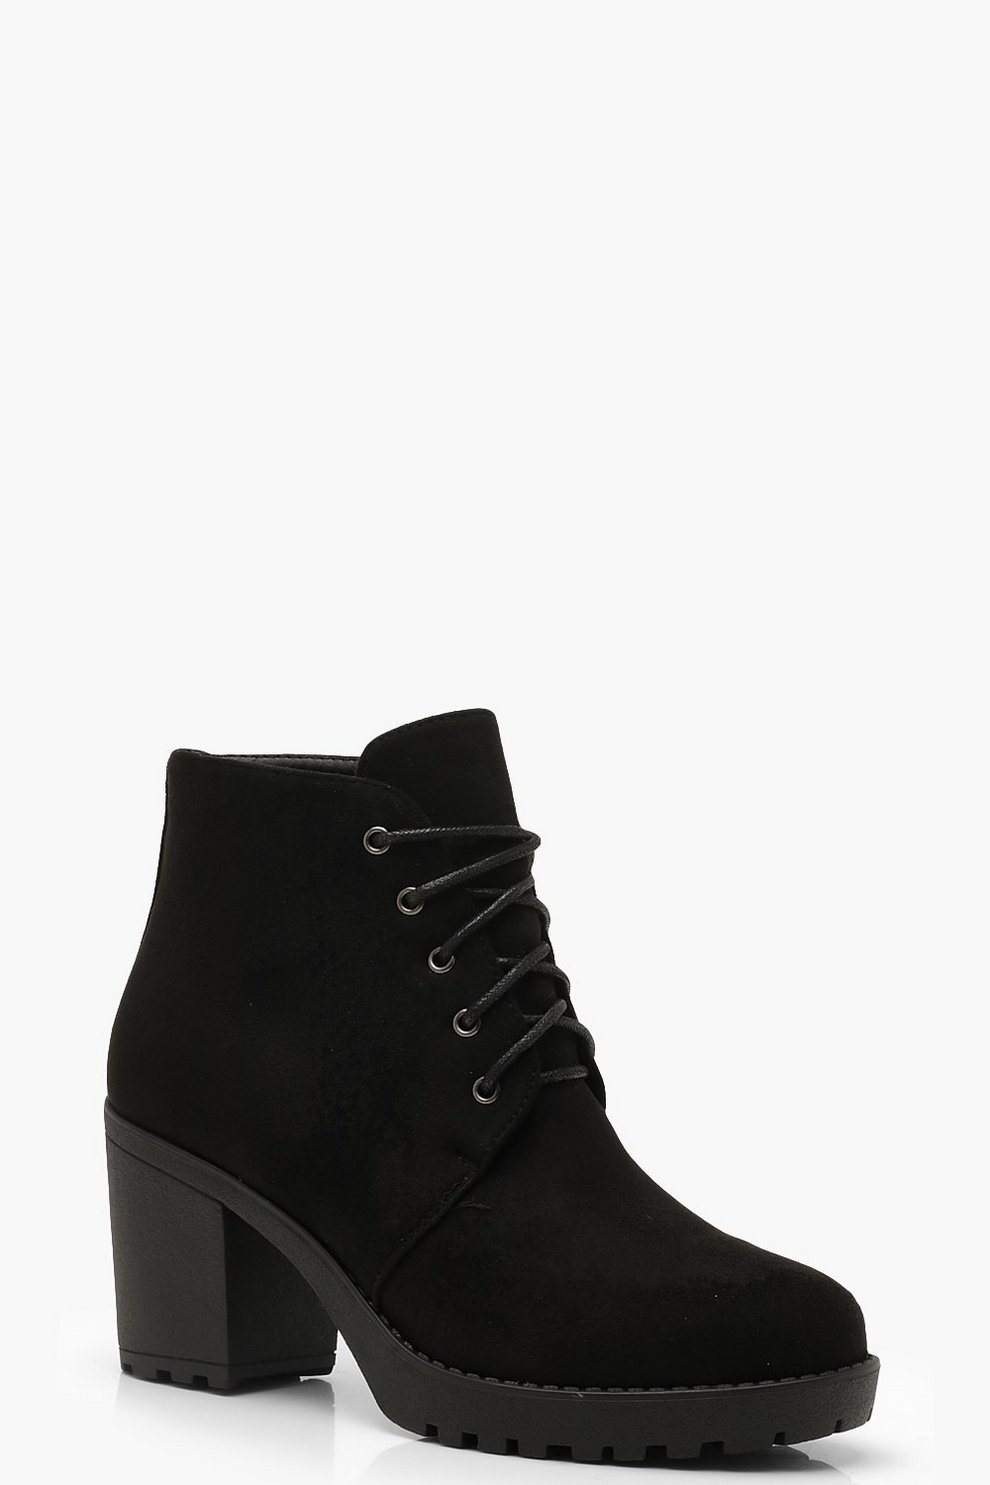 e565848a784 Lace Up Chunky Heel Hiker Boots